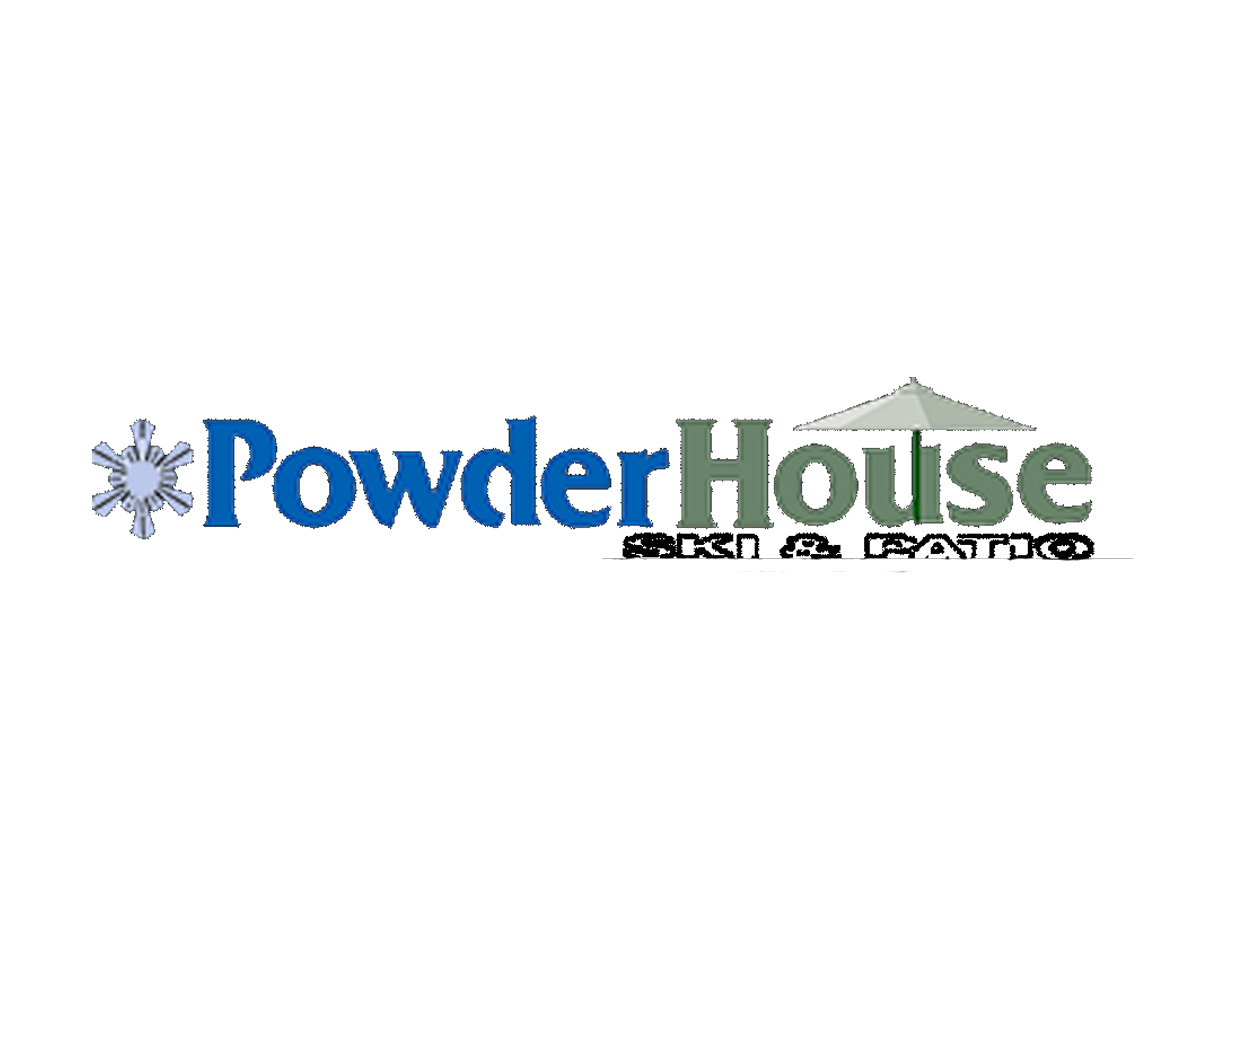 Poder House